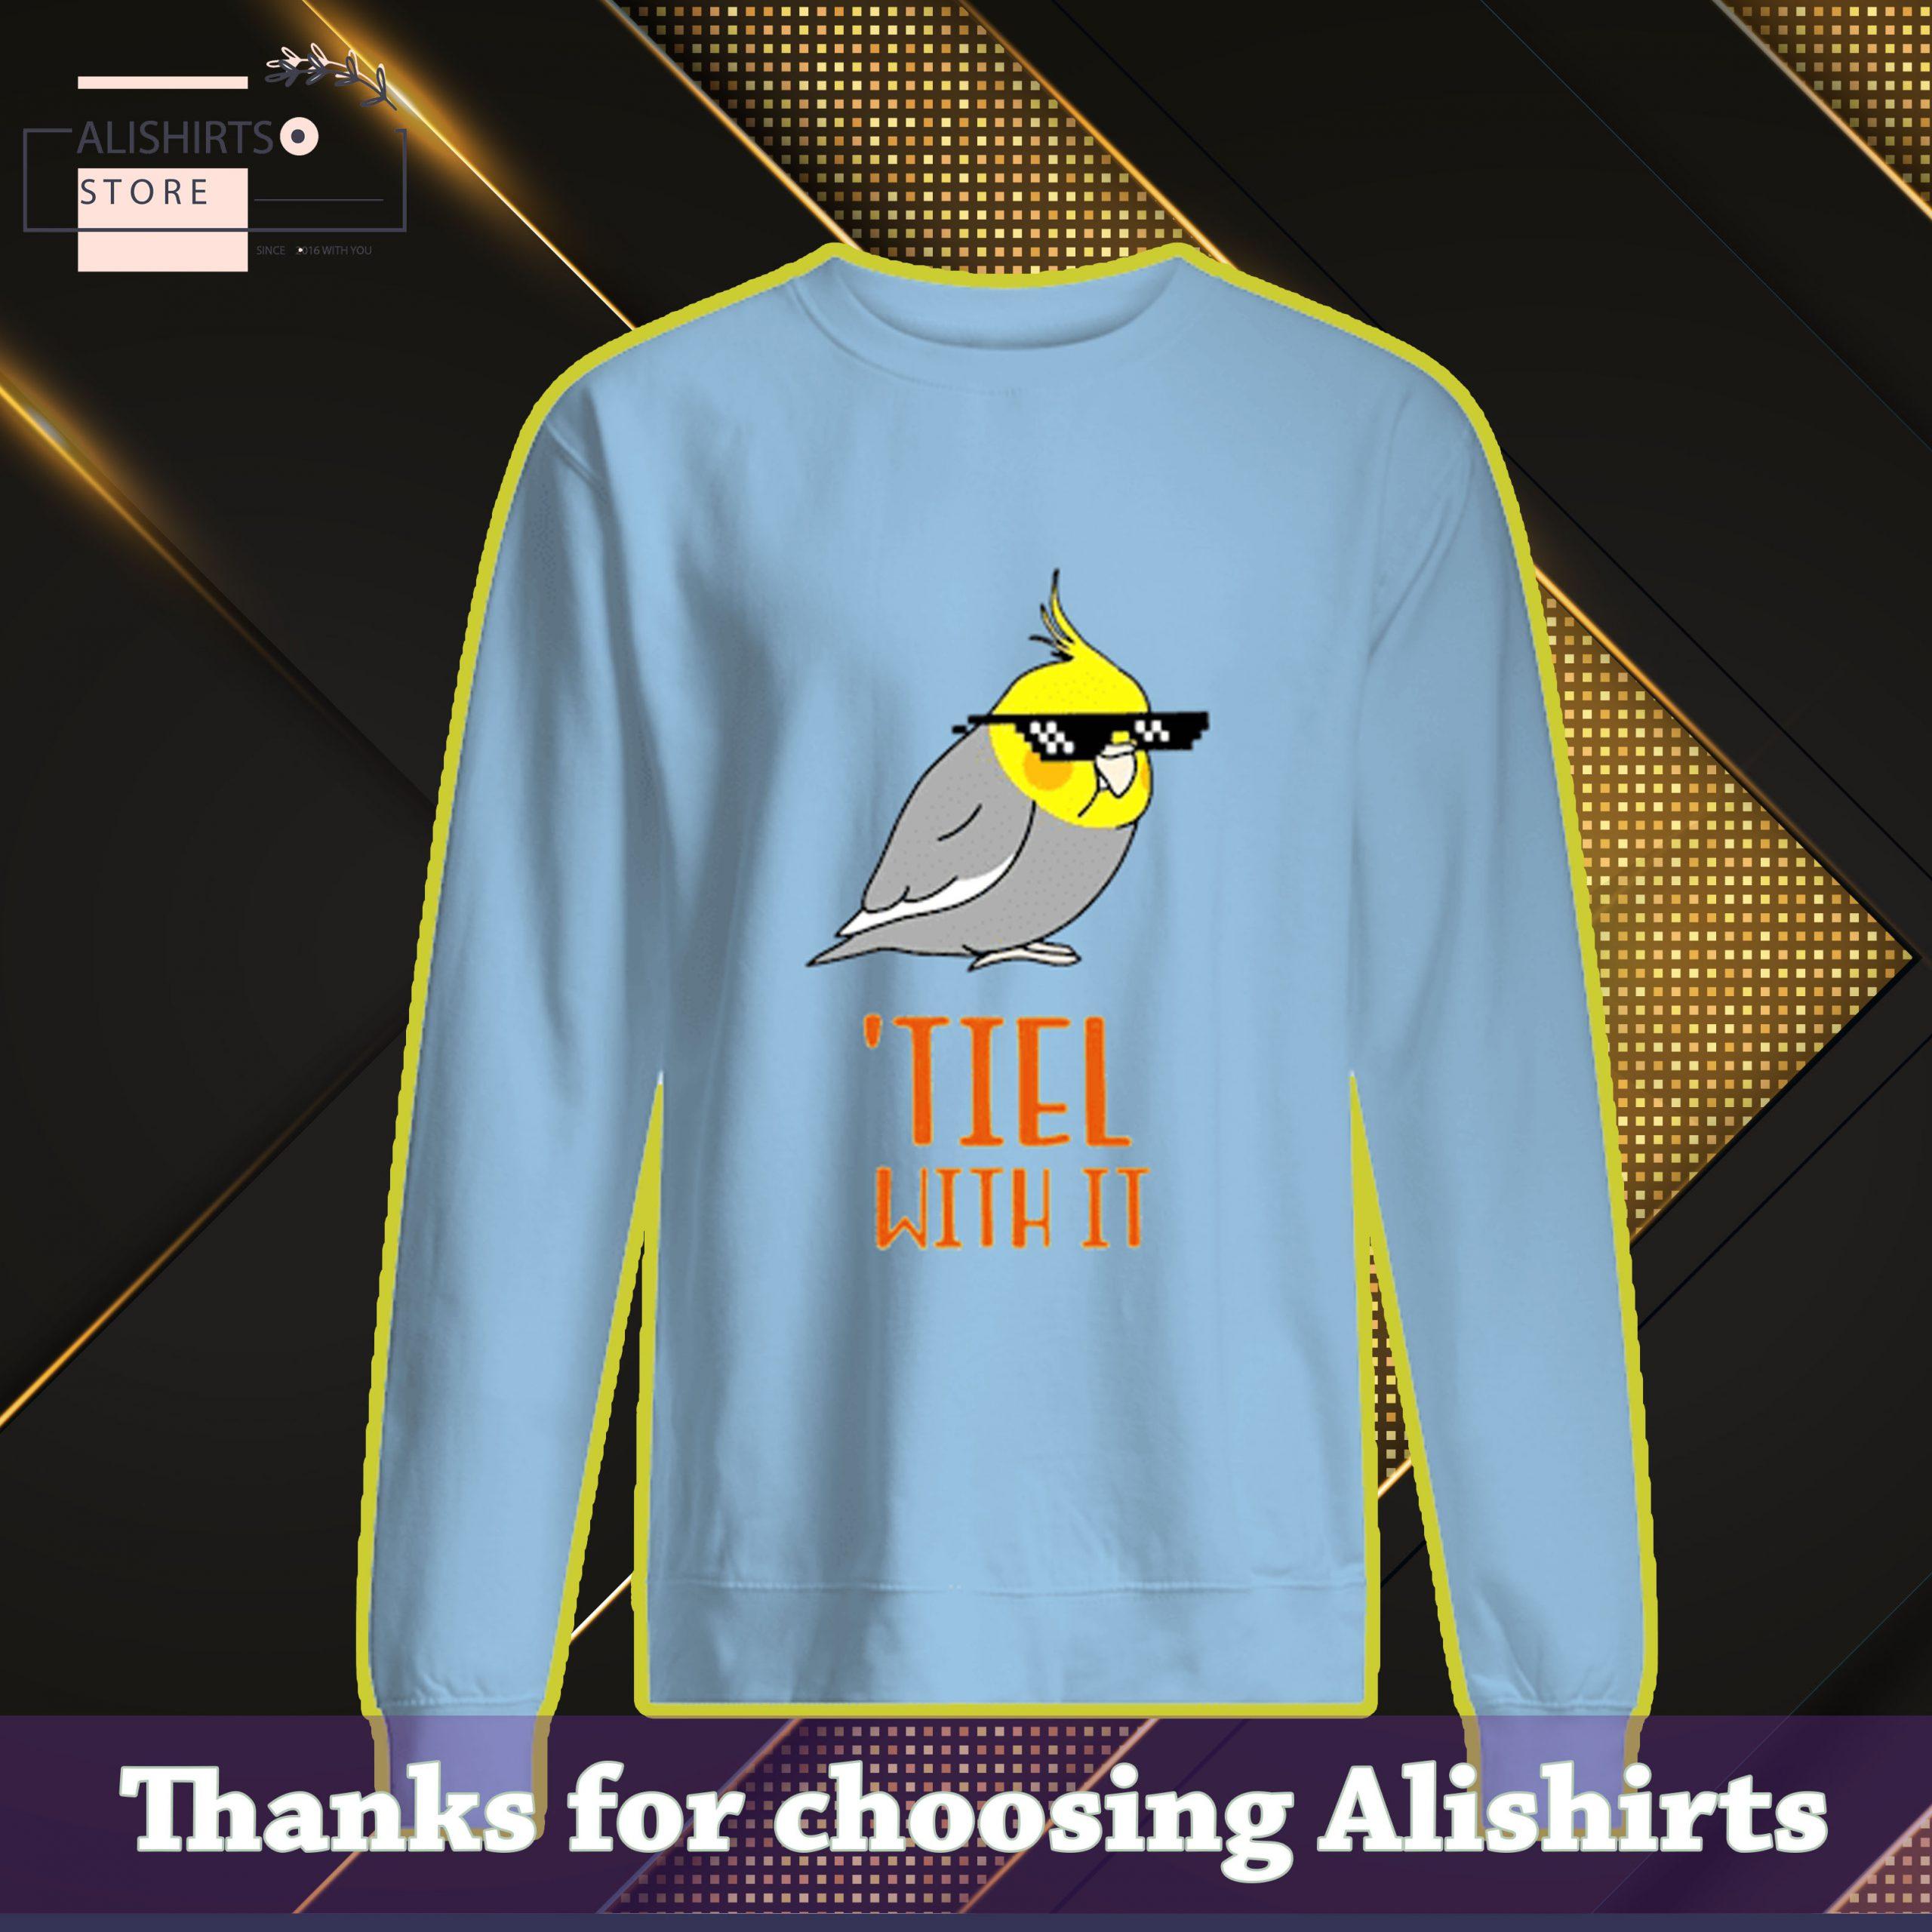 Cockatiel Bird tiel with it shirt